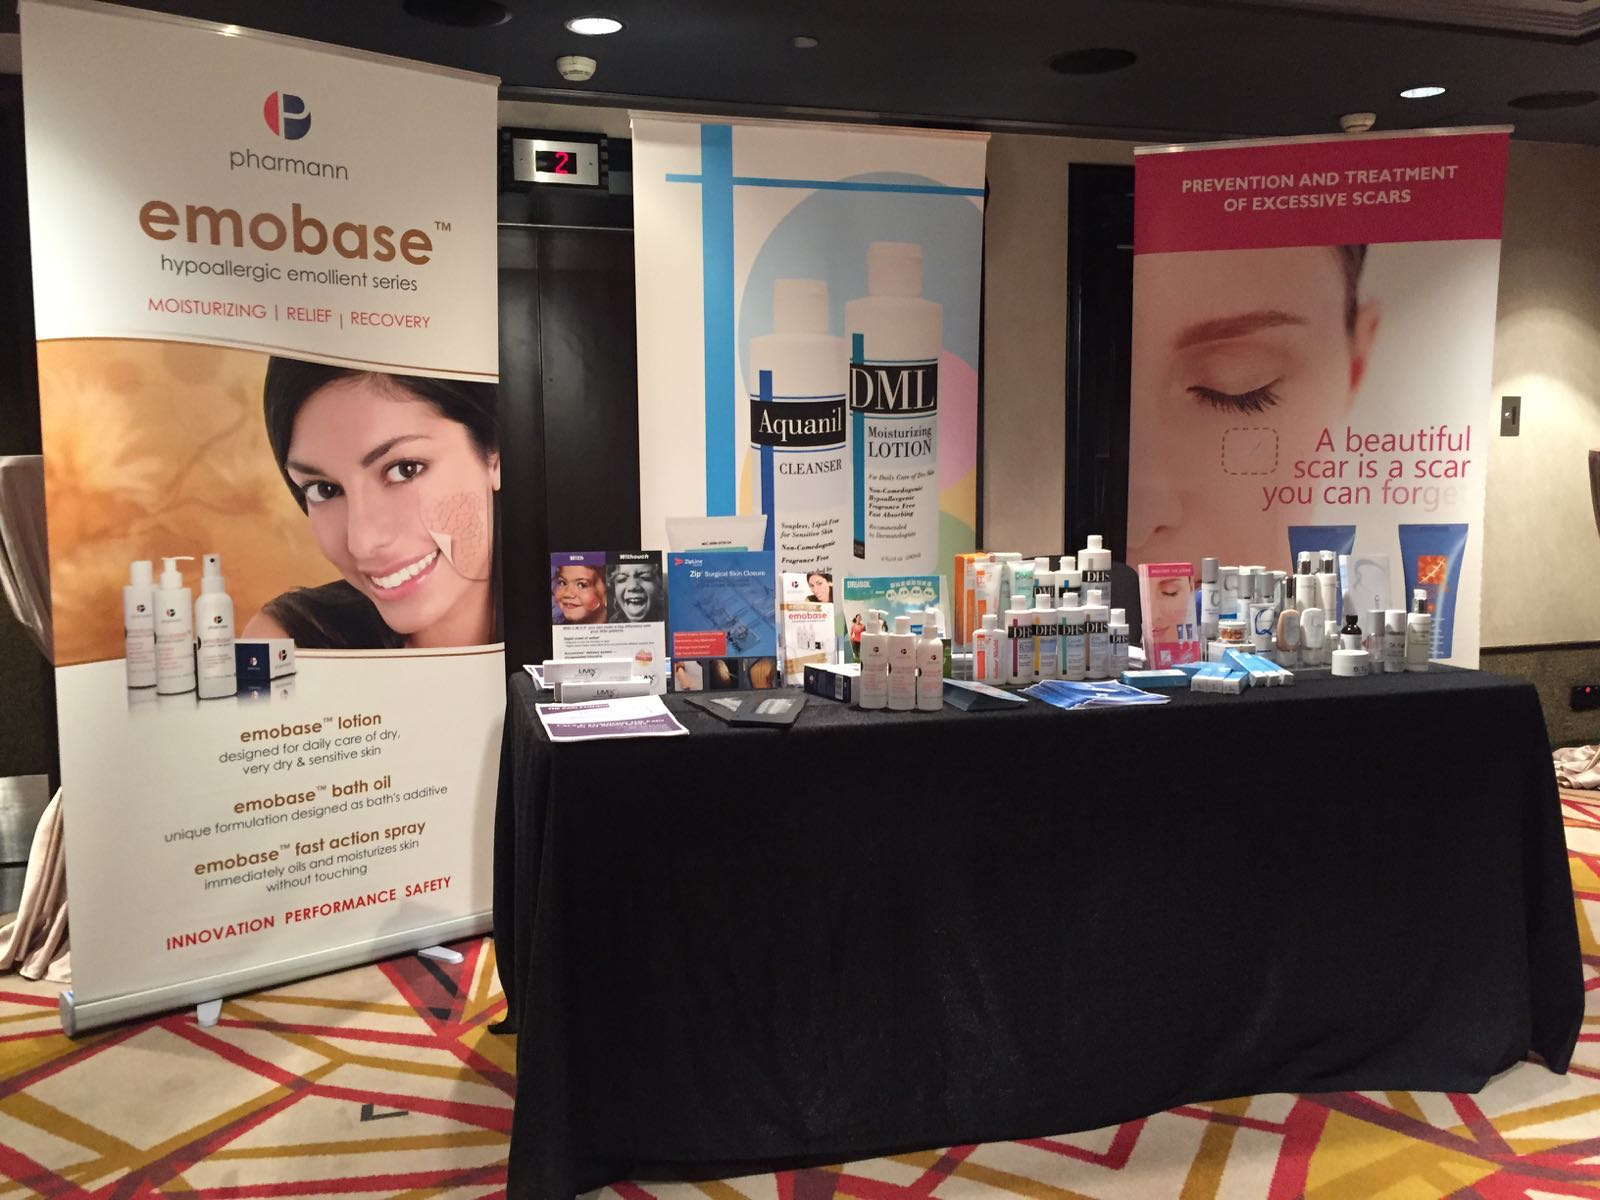 dermatology-conference.jpg